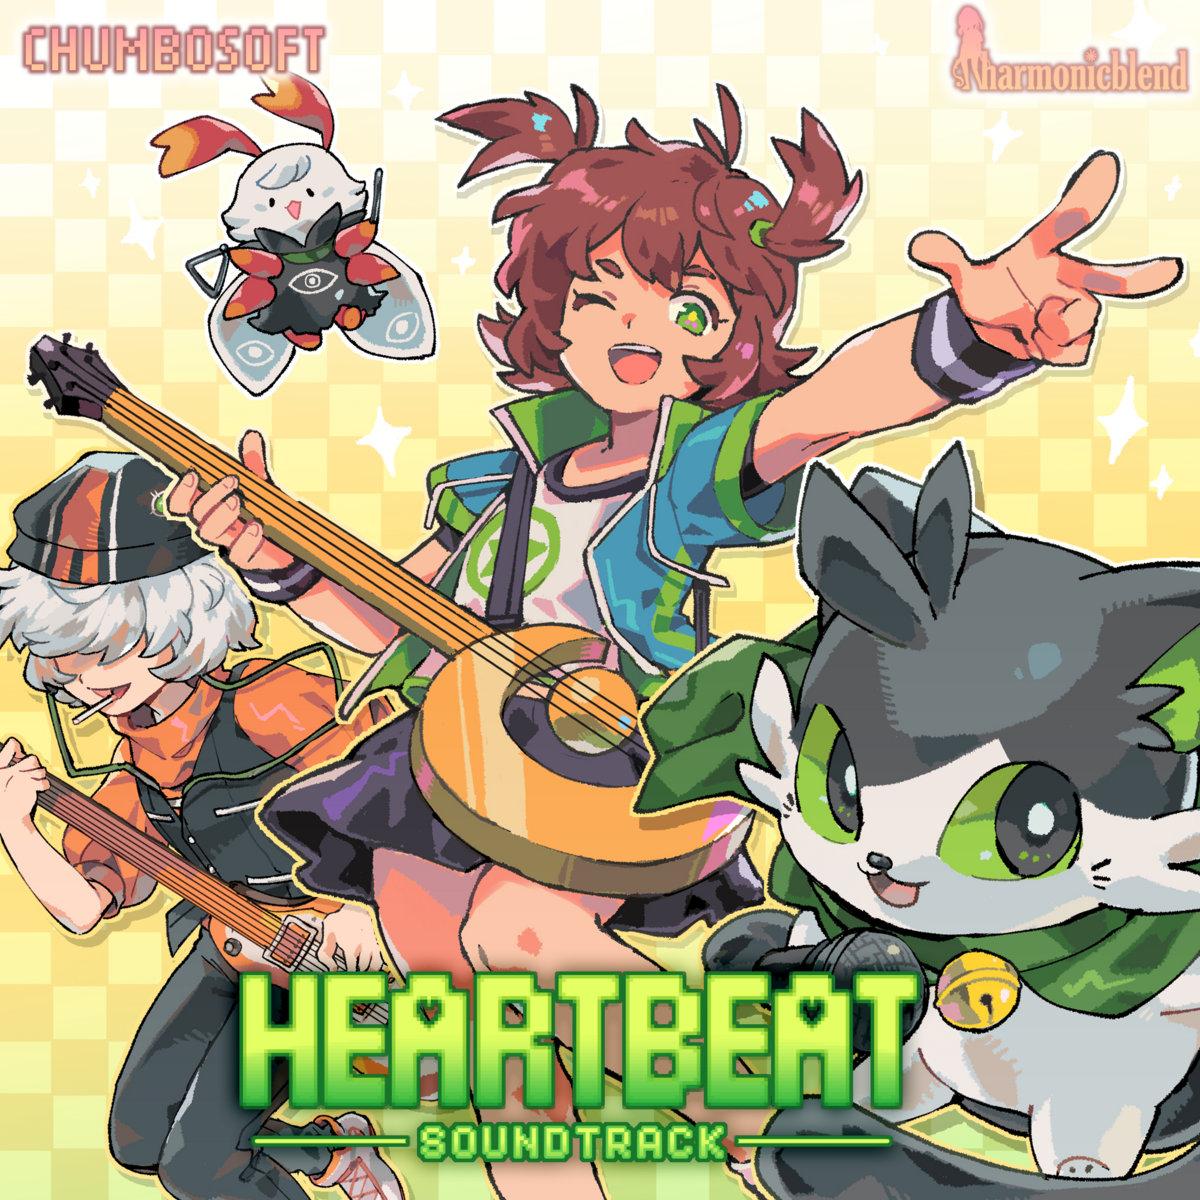 HEARTBEAT Original Soundtrack | harmonicblend